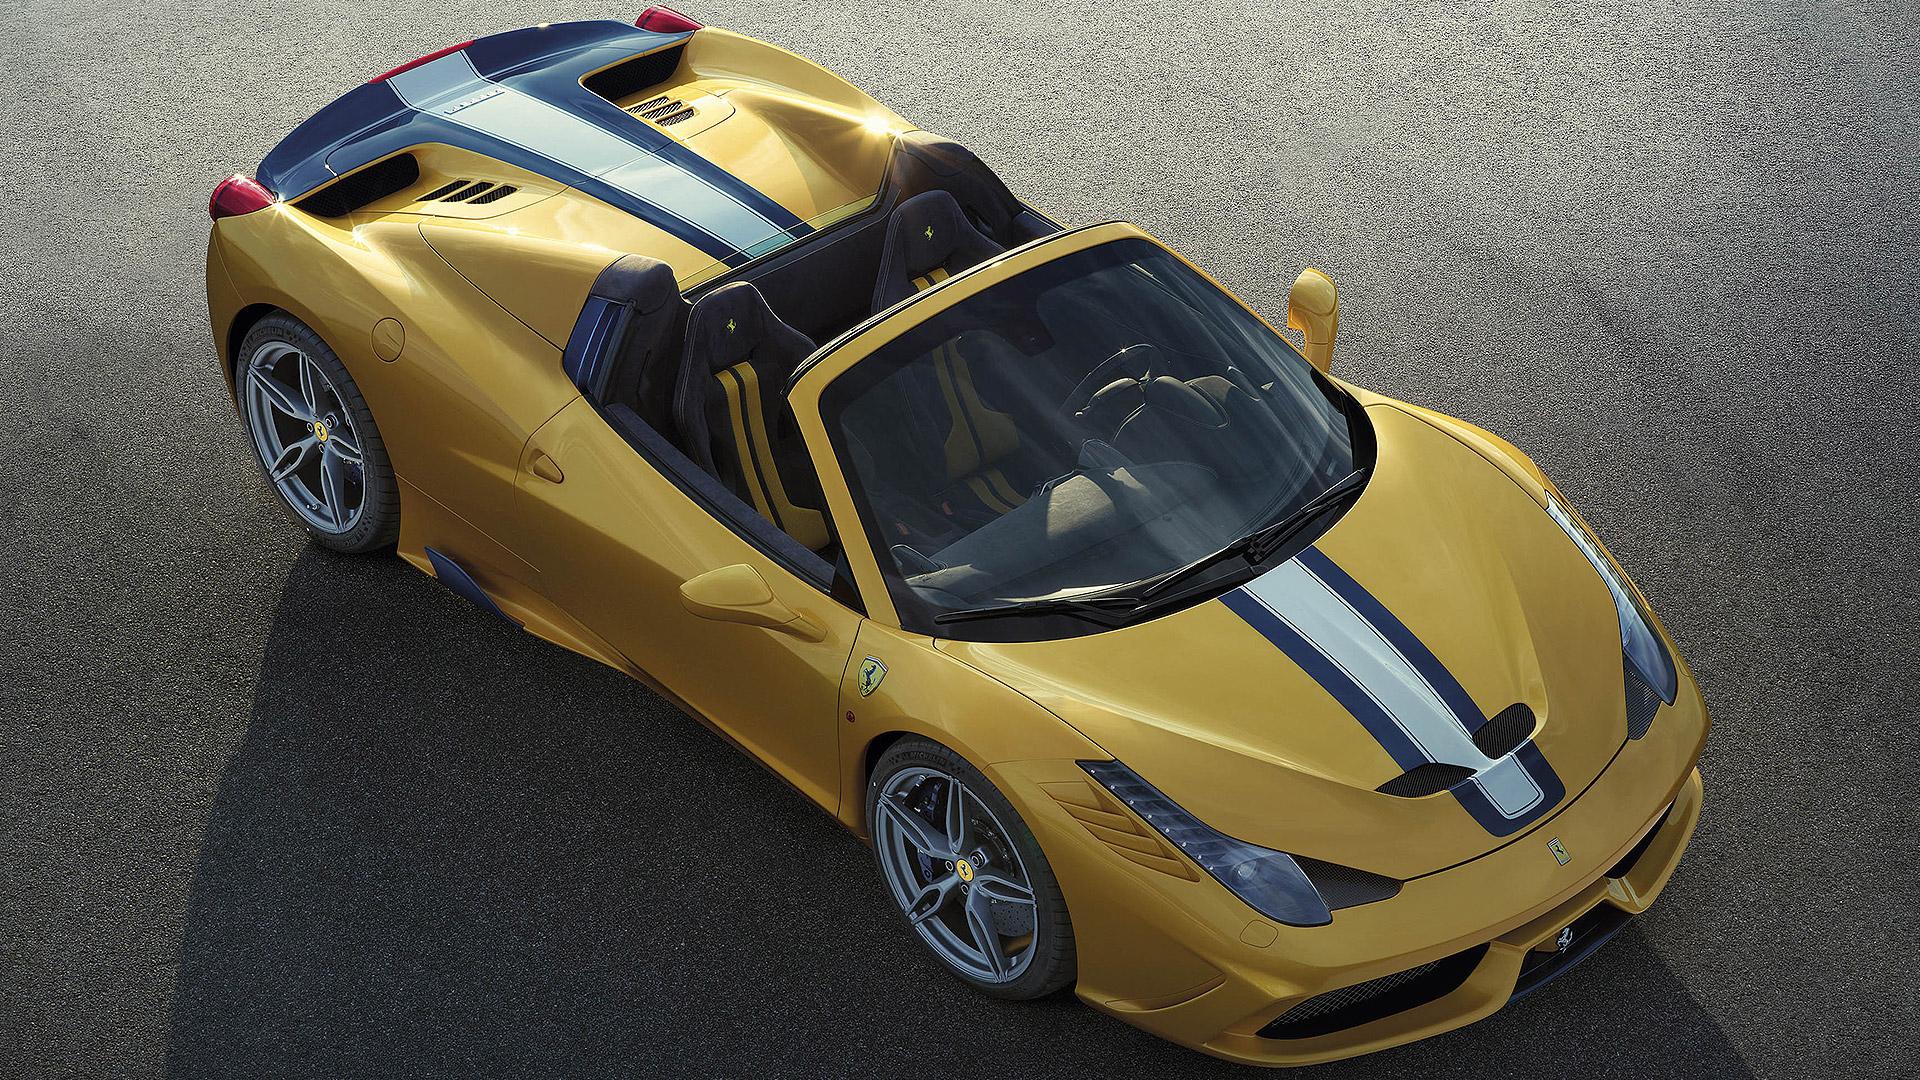 Ferrari 458 2015 Speciale A Exterior